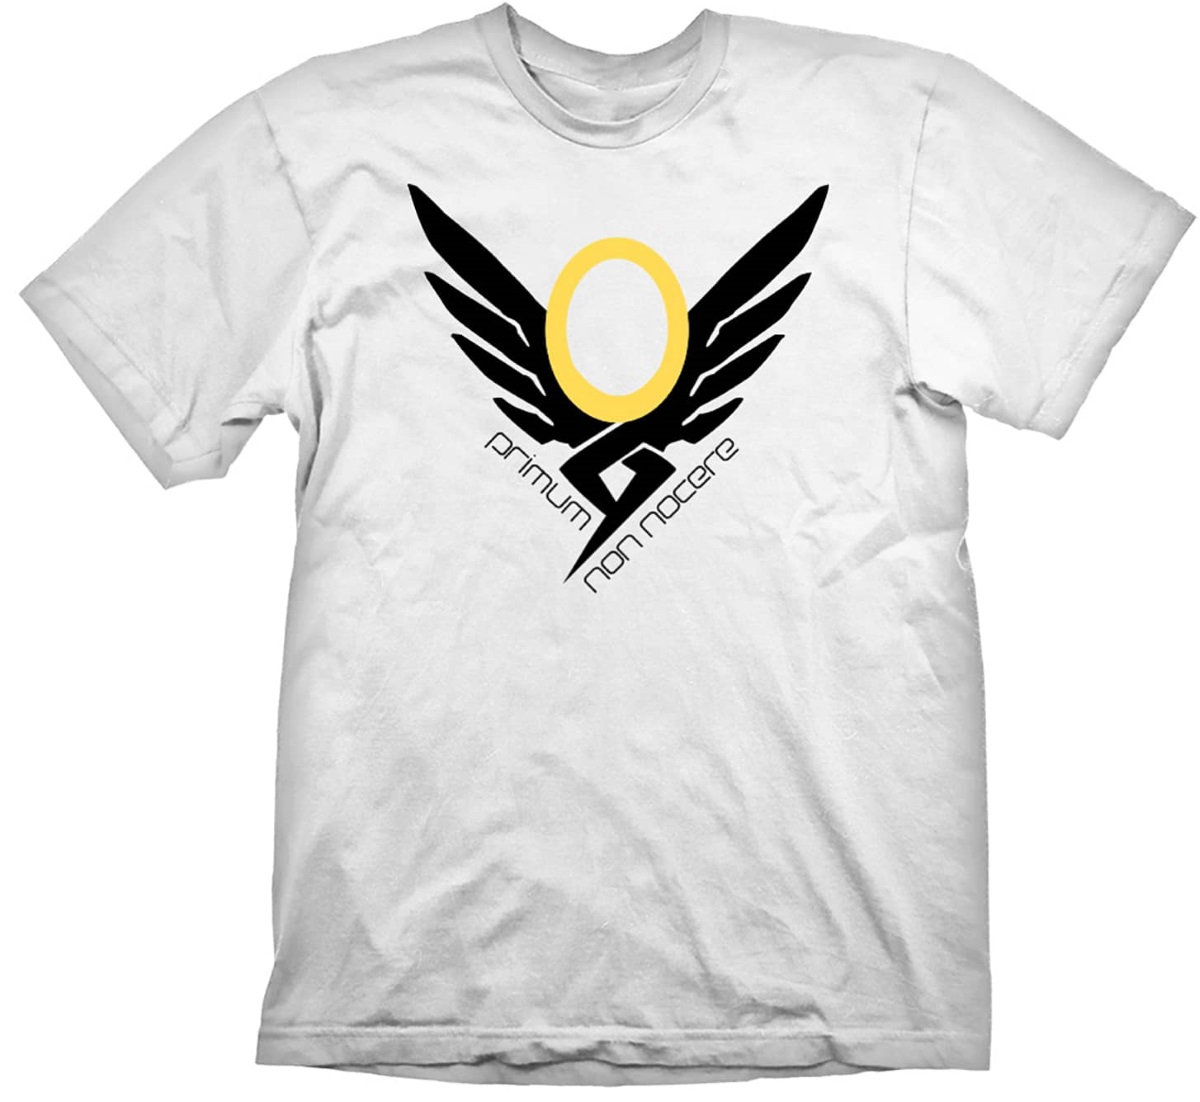 Футболка Overwatch: Mercy (белая) операция валькирия